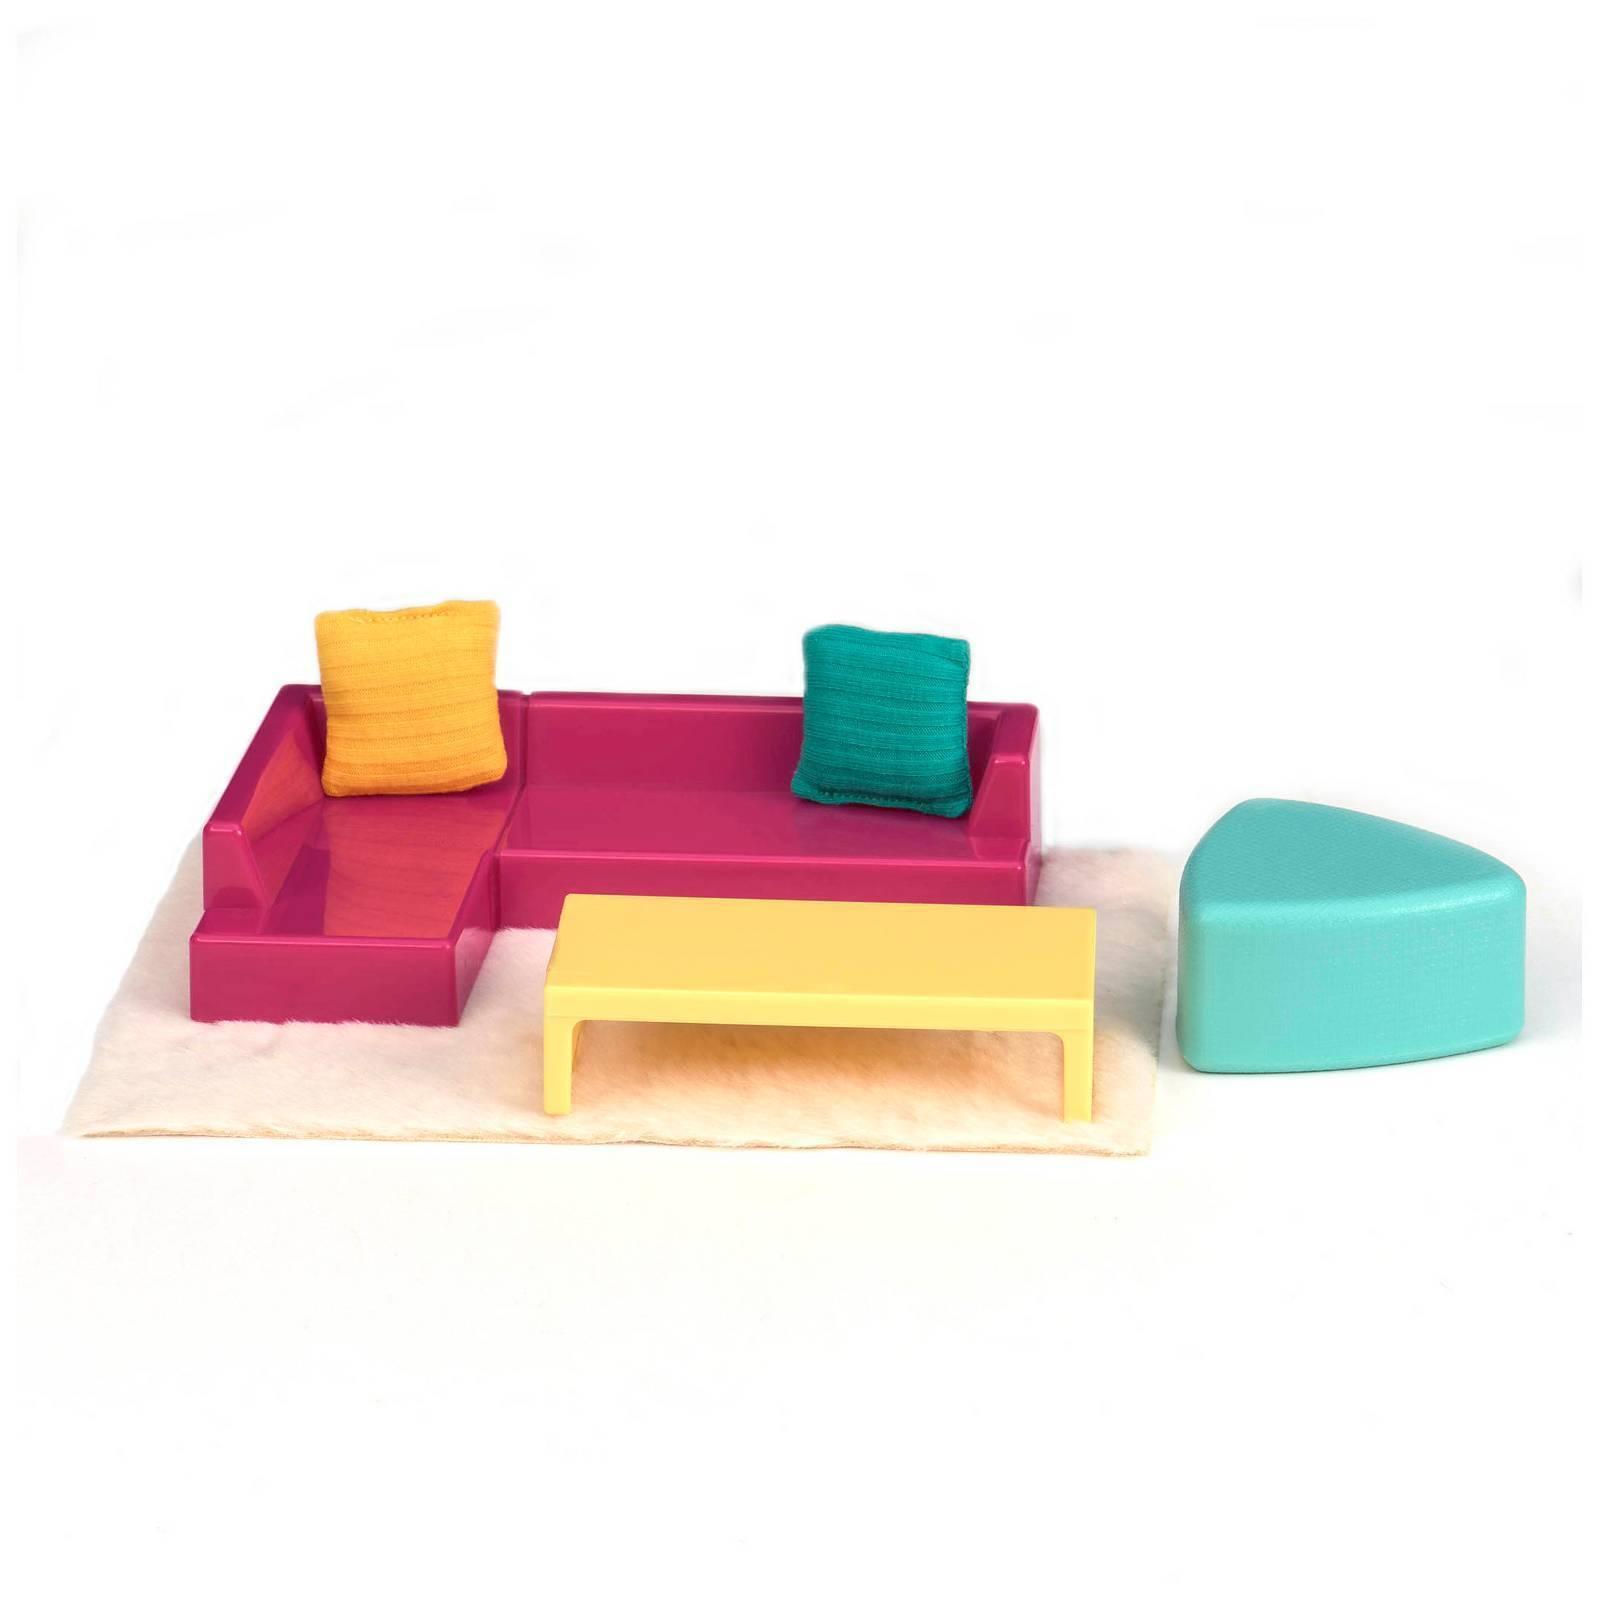 Lori Lo37012z Living Room Lounge Fashion Doll Furniture Set | eBay